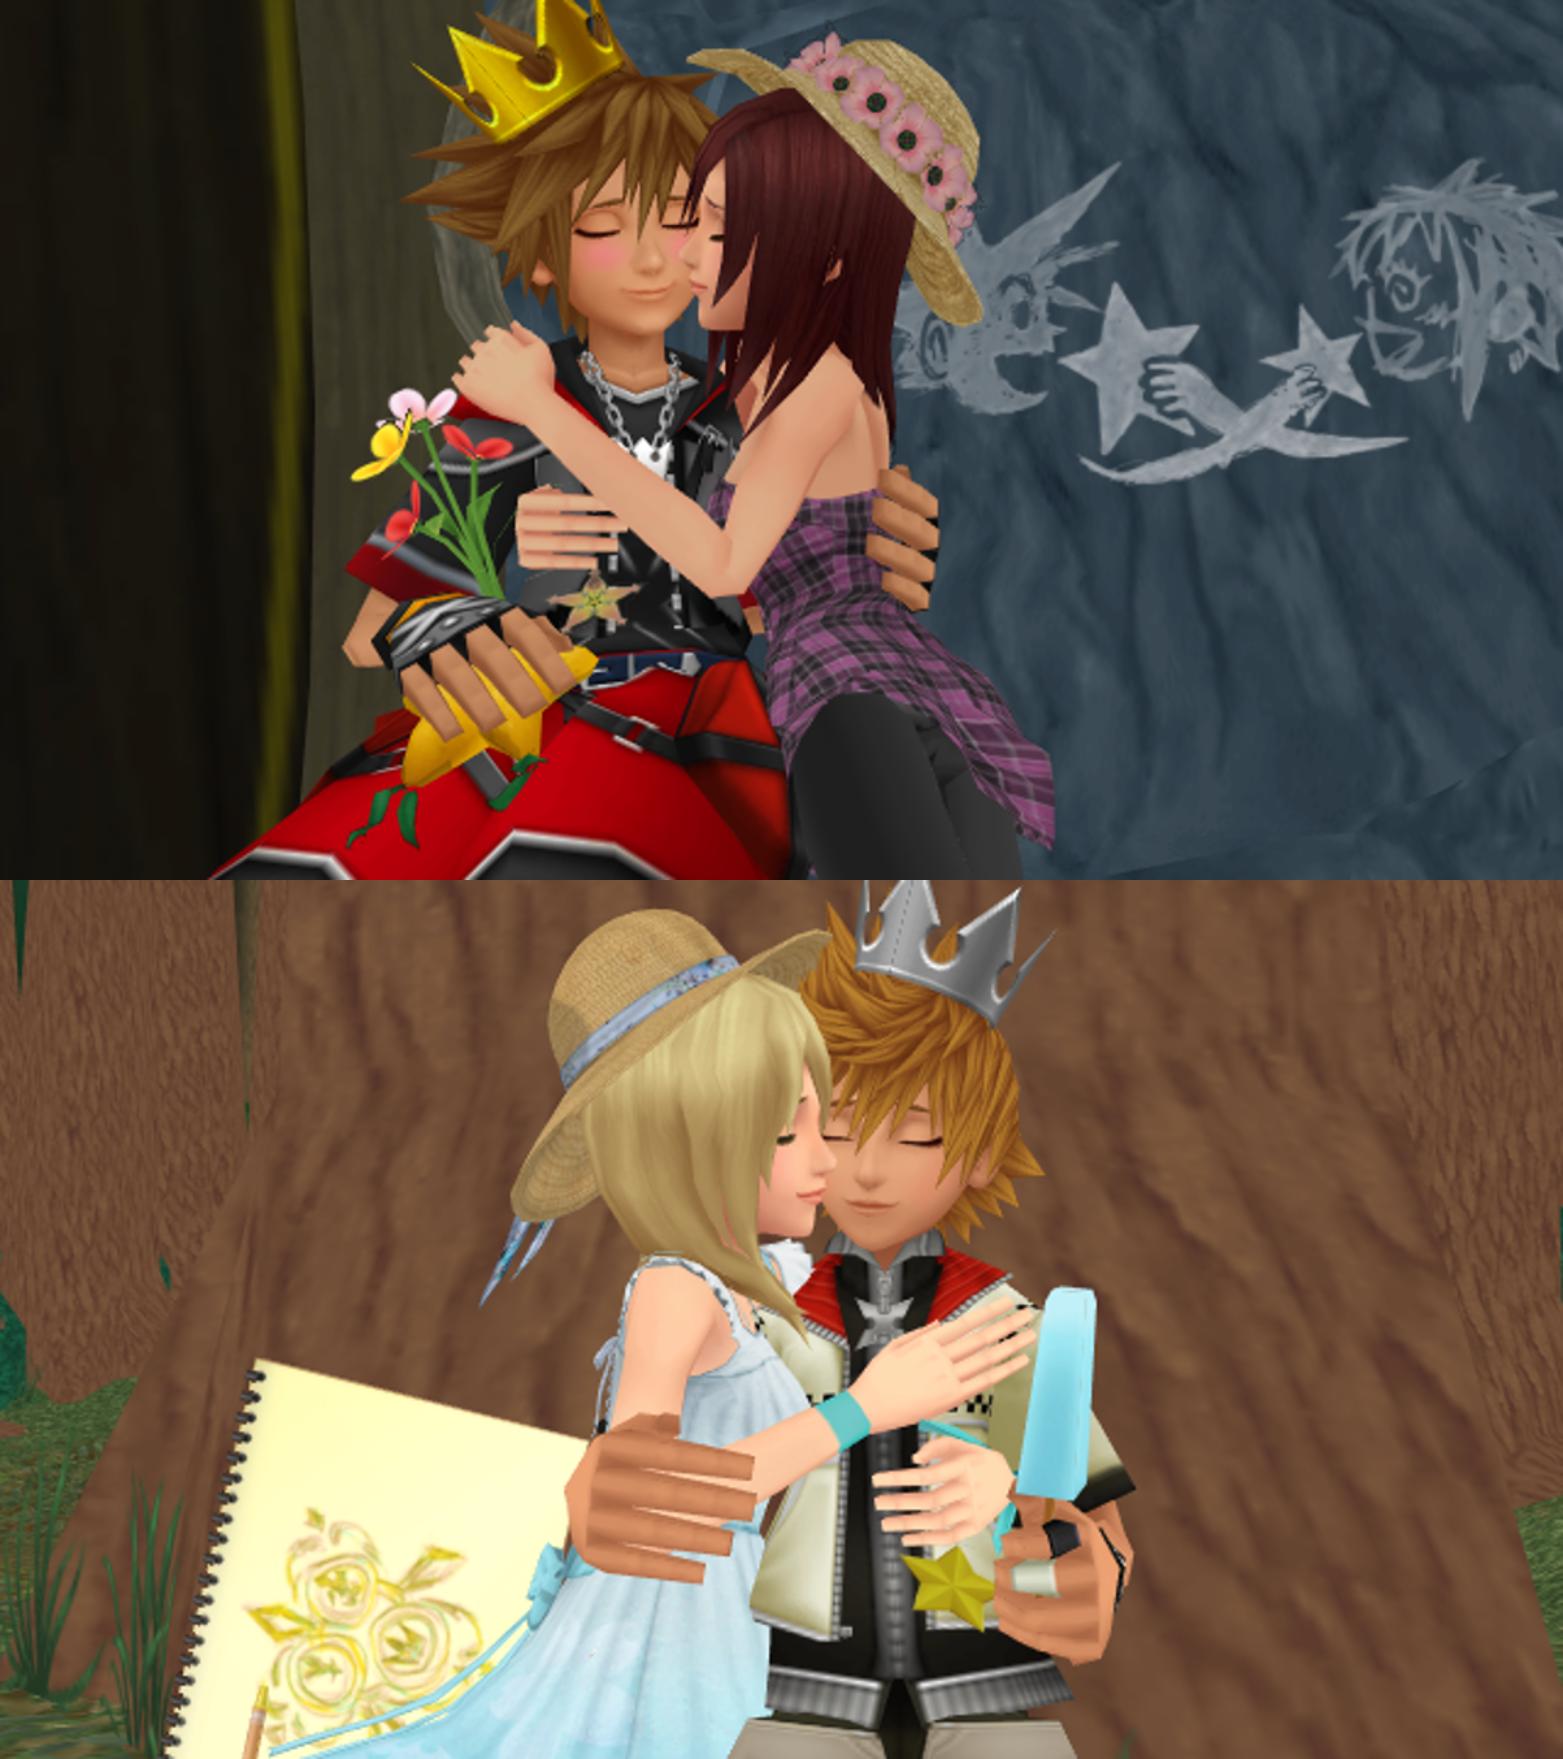 If Kingdom Hearts Met Anime By Takuyarawr On Deviantart: Last Sora X Kairi And Roxas X Namine Sweet Kiss By 9029561